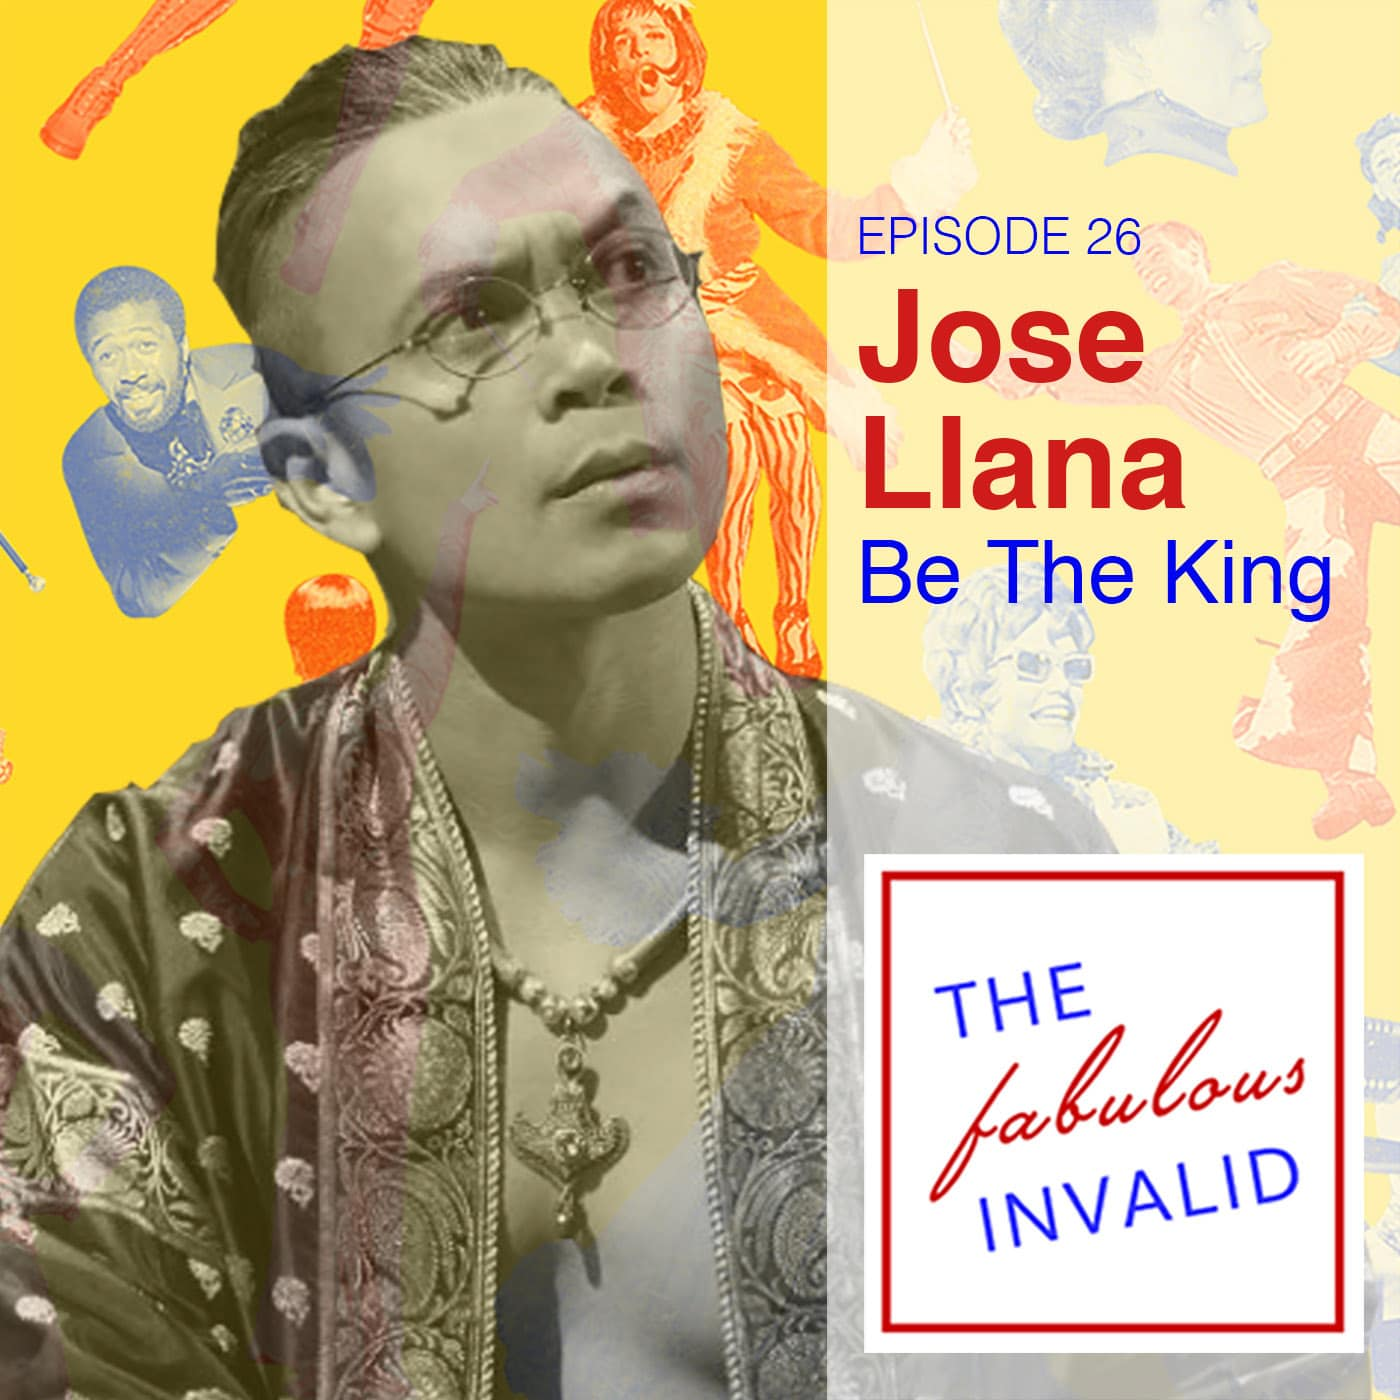 The Fabulous Invalid Ep 26 Jose Llana